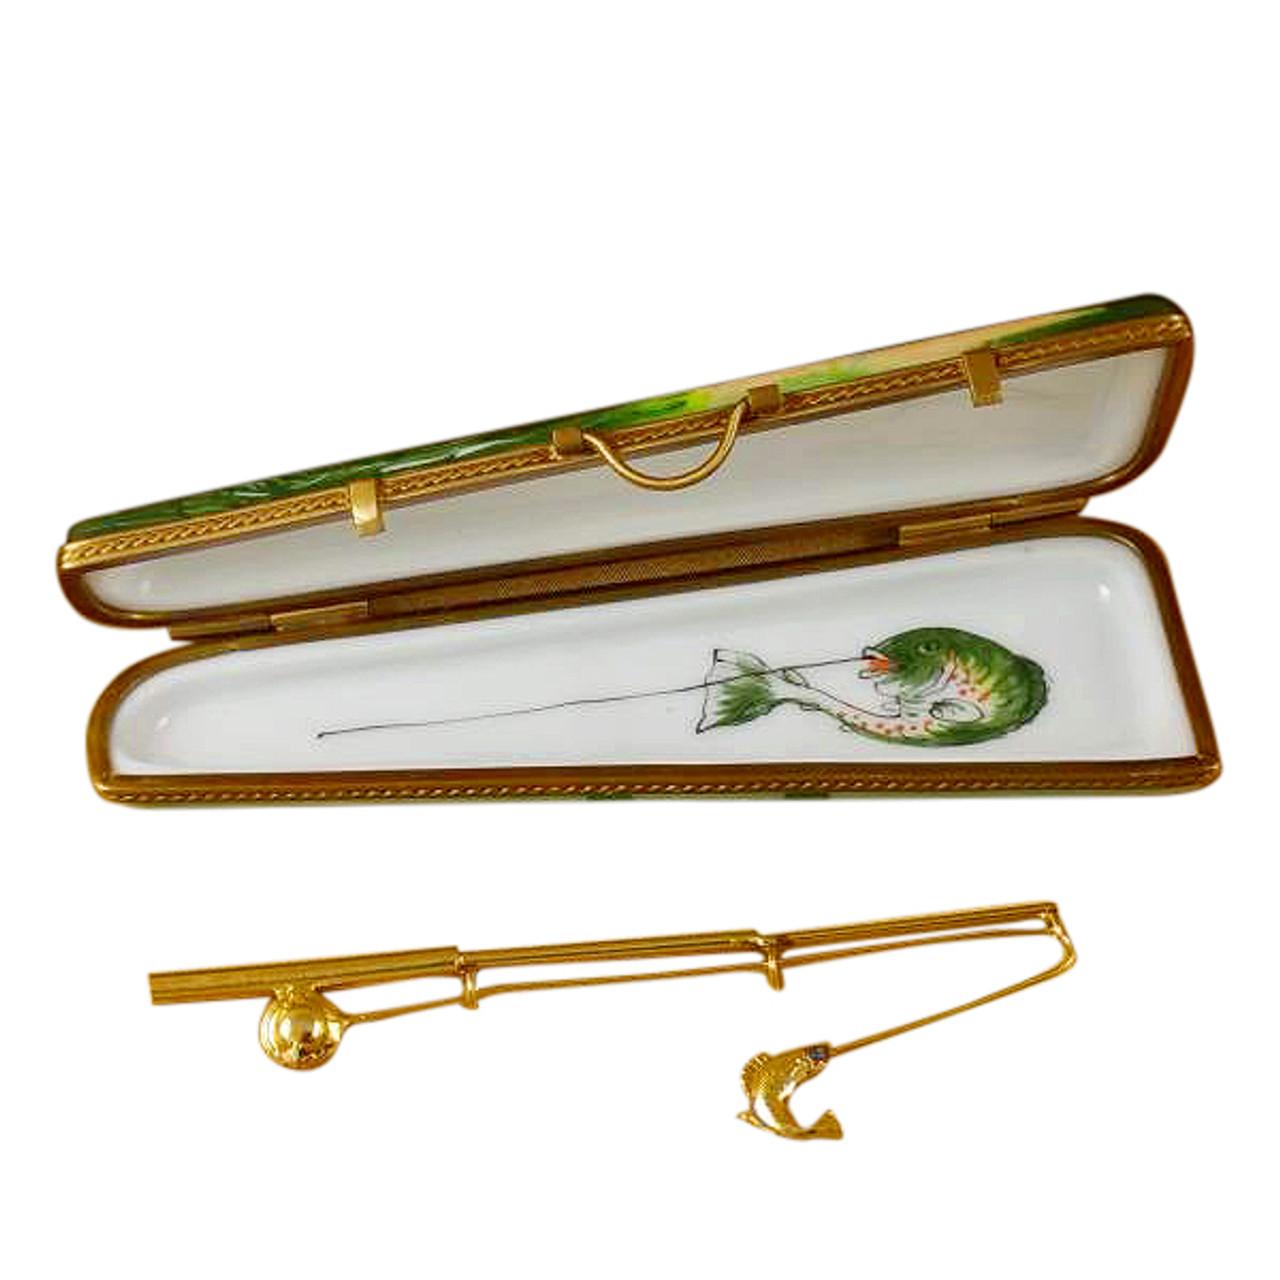 Limoges Imports Fishing Case W/Rod Limoges Box